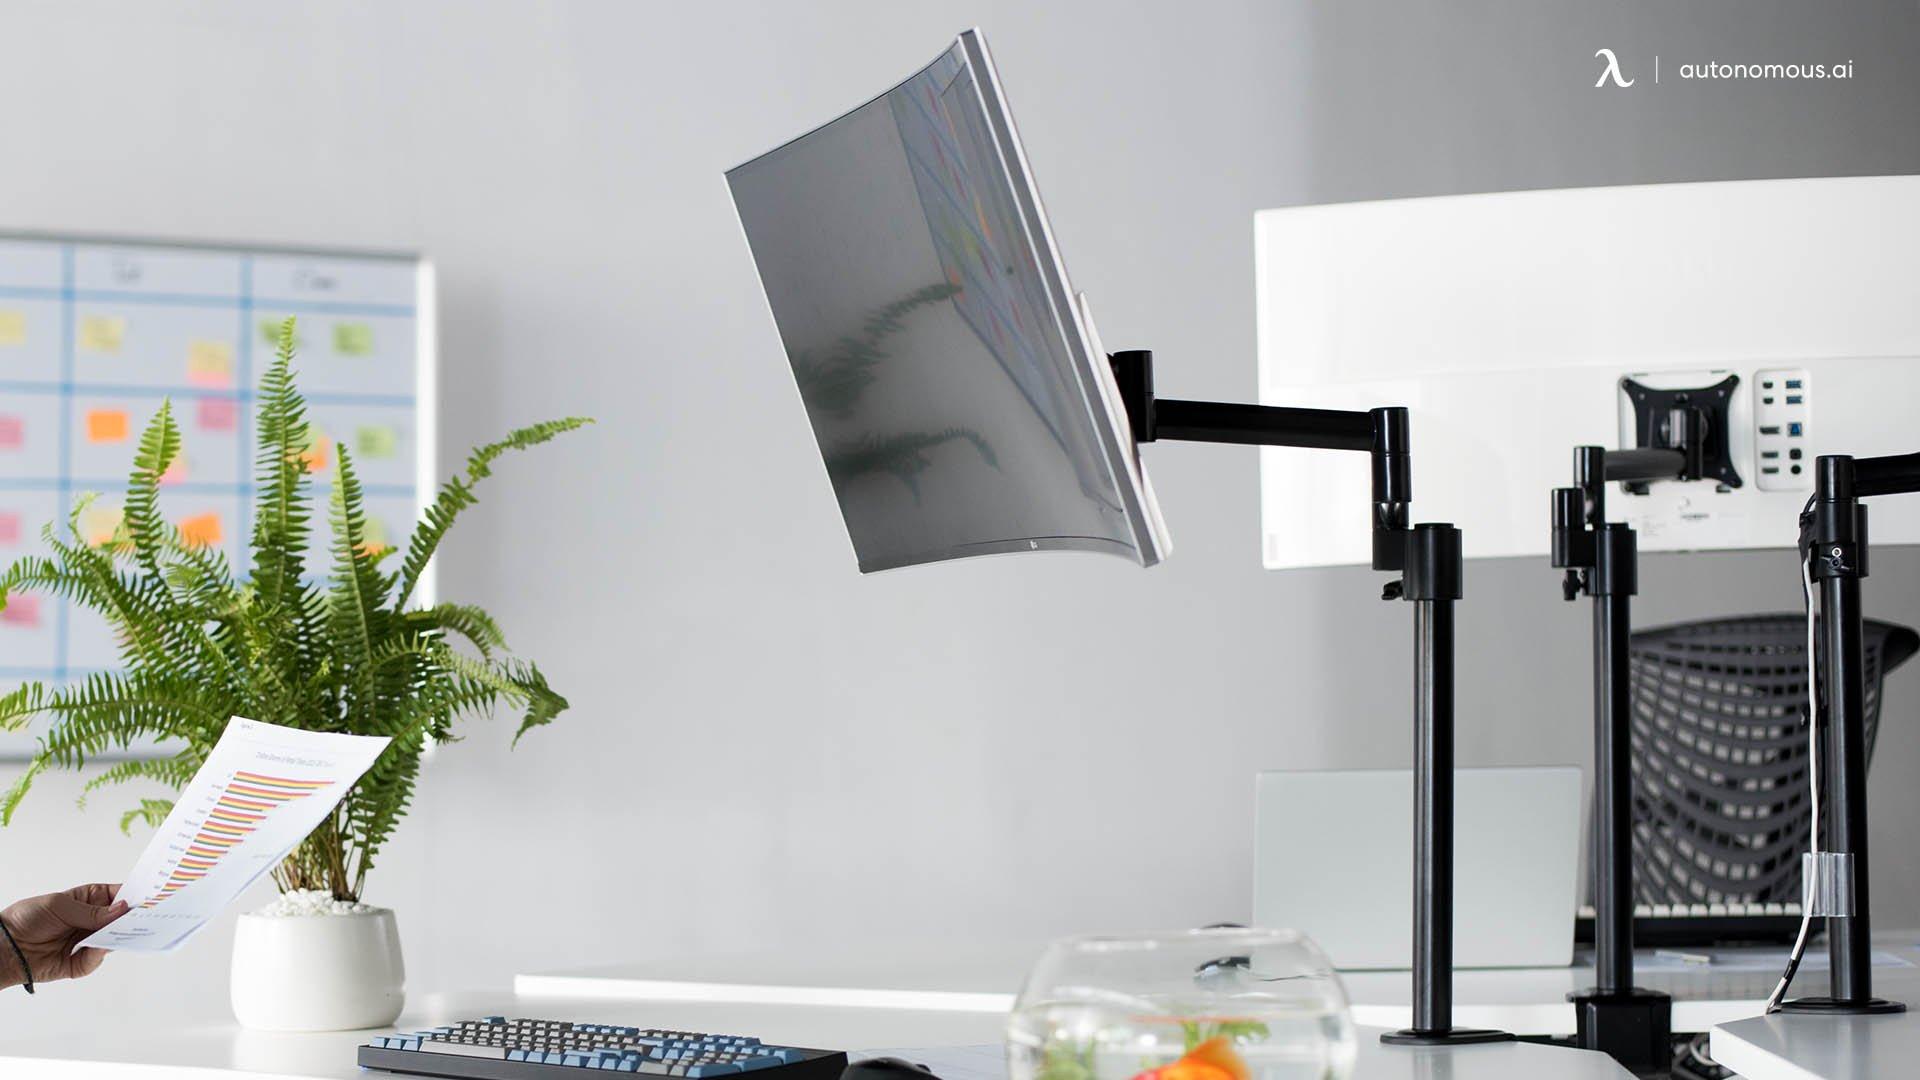 Extending Your Minimalist MacBook Desk Setup